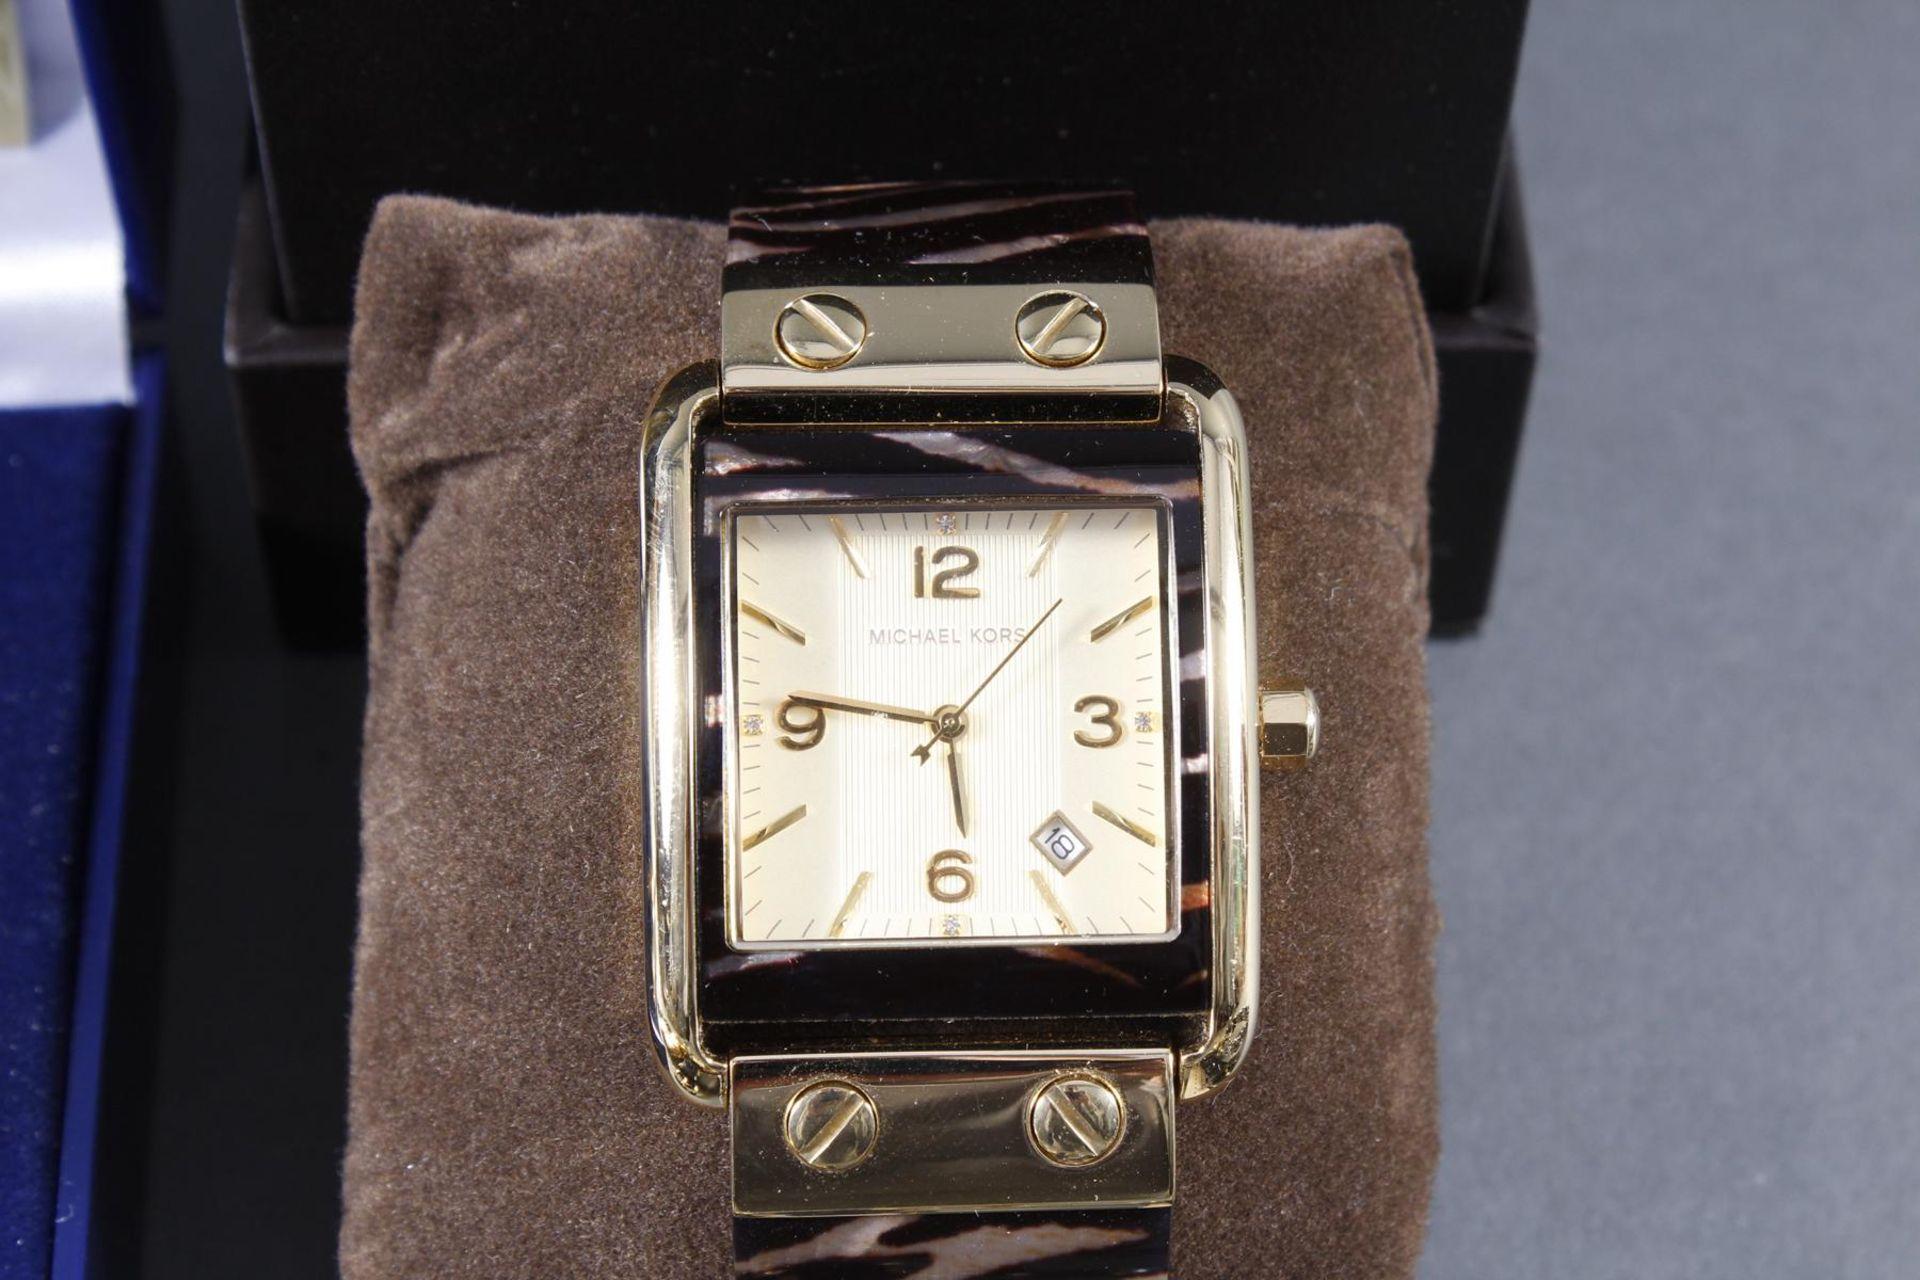 Konvolut Damen und Herrenarmbanduhren, 14 Stück - Bild 5 aus 7